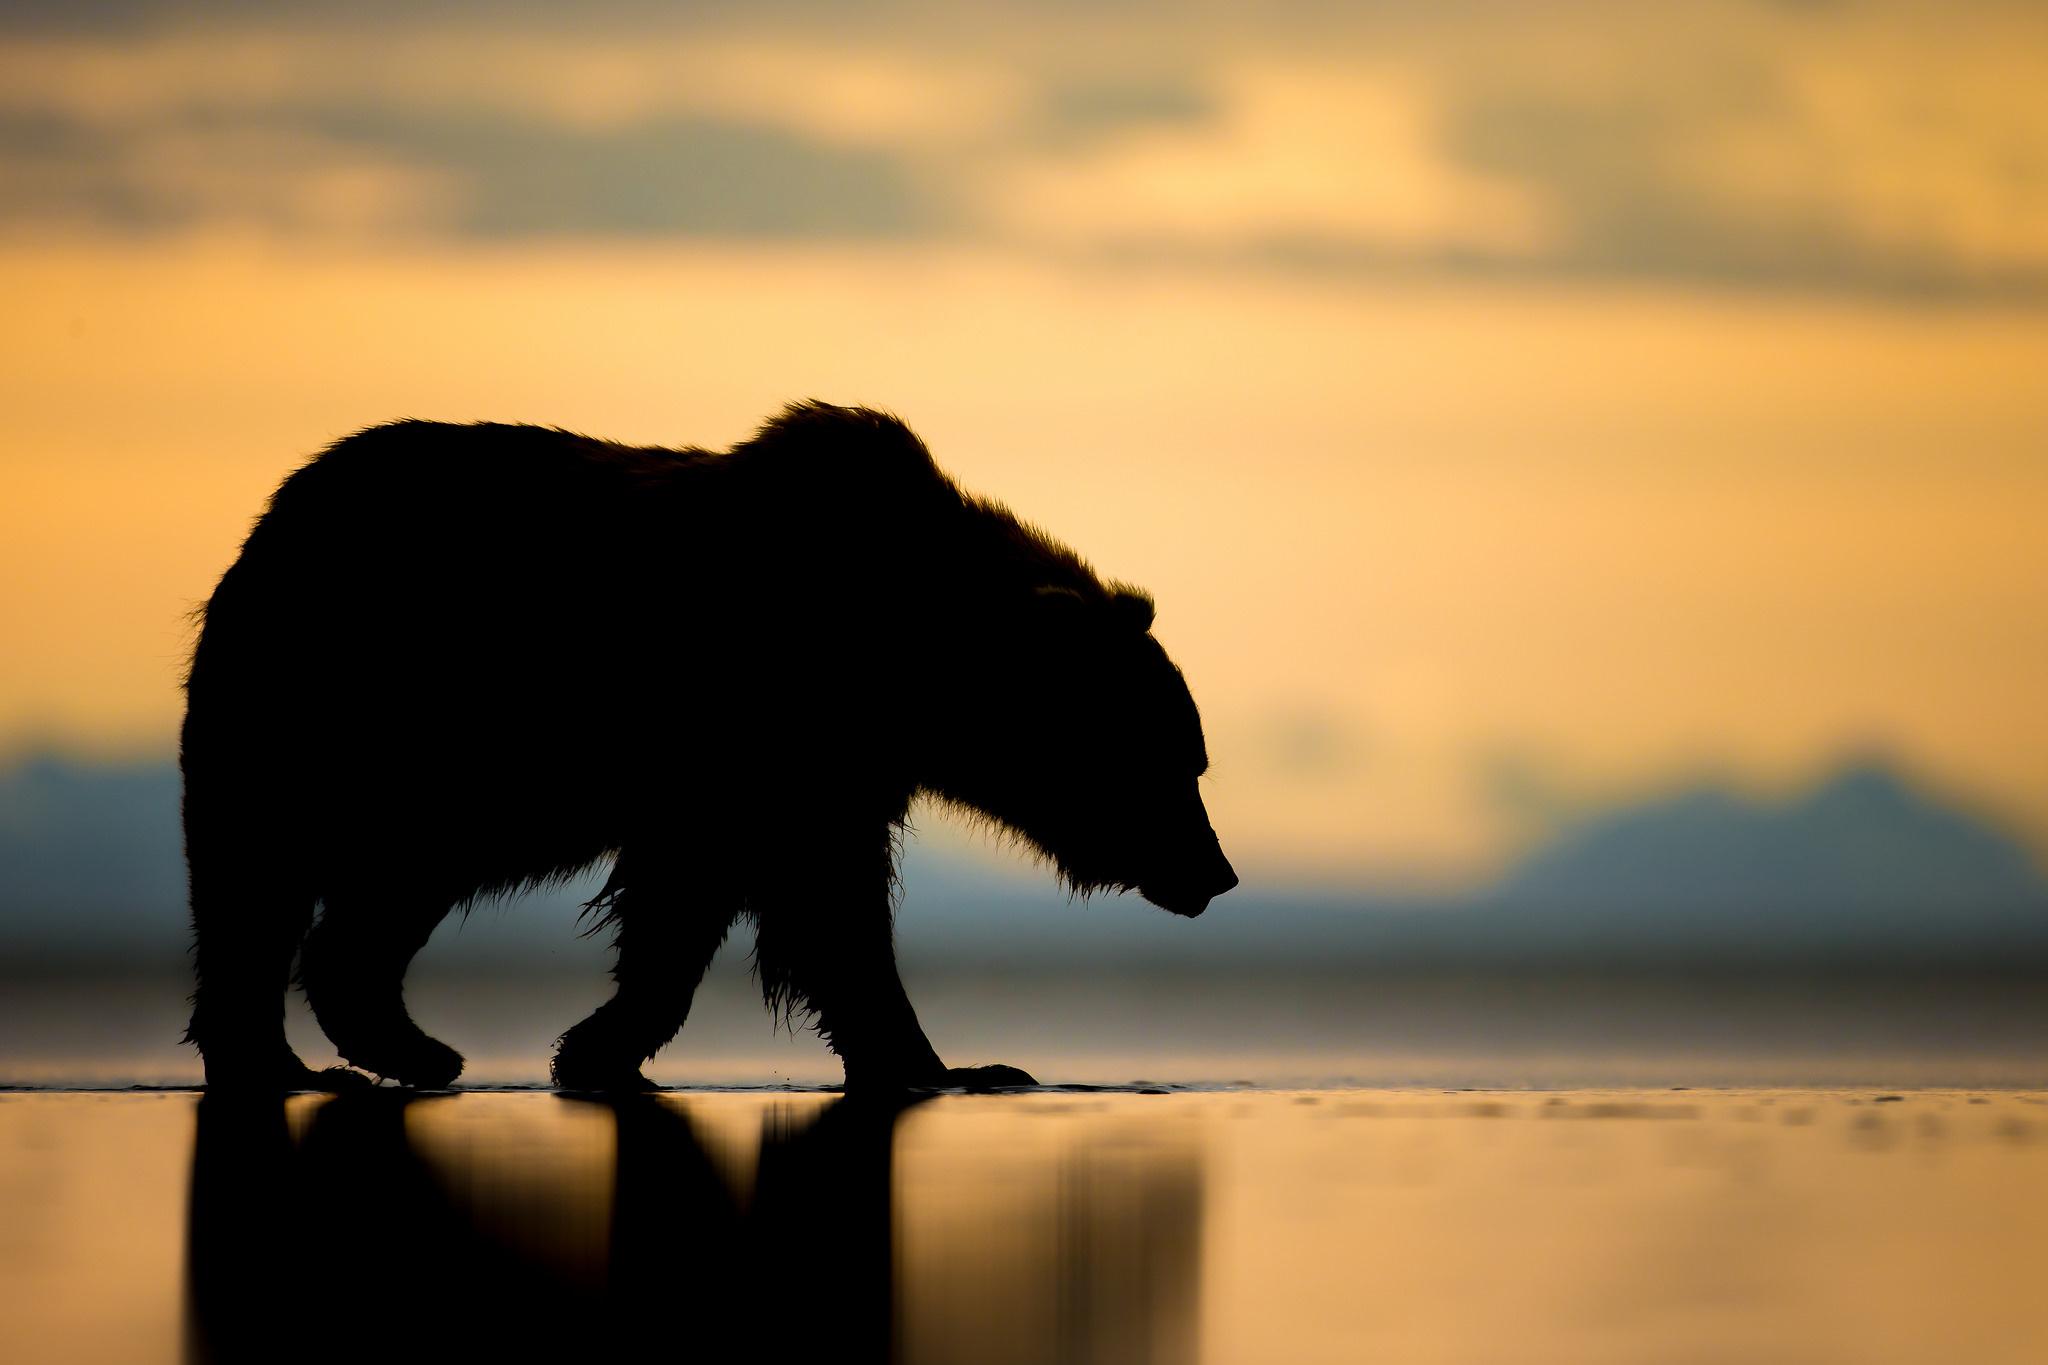 Alaskan Brown Bear Silhouetted Against Mount Katolinat, Alaska  № 1442462 загрузить